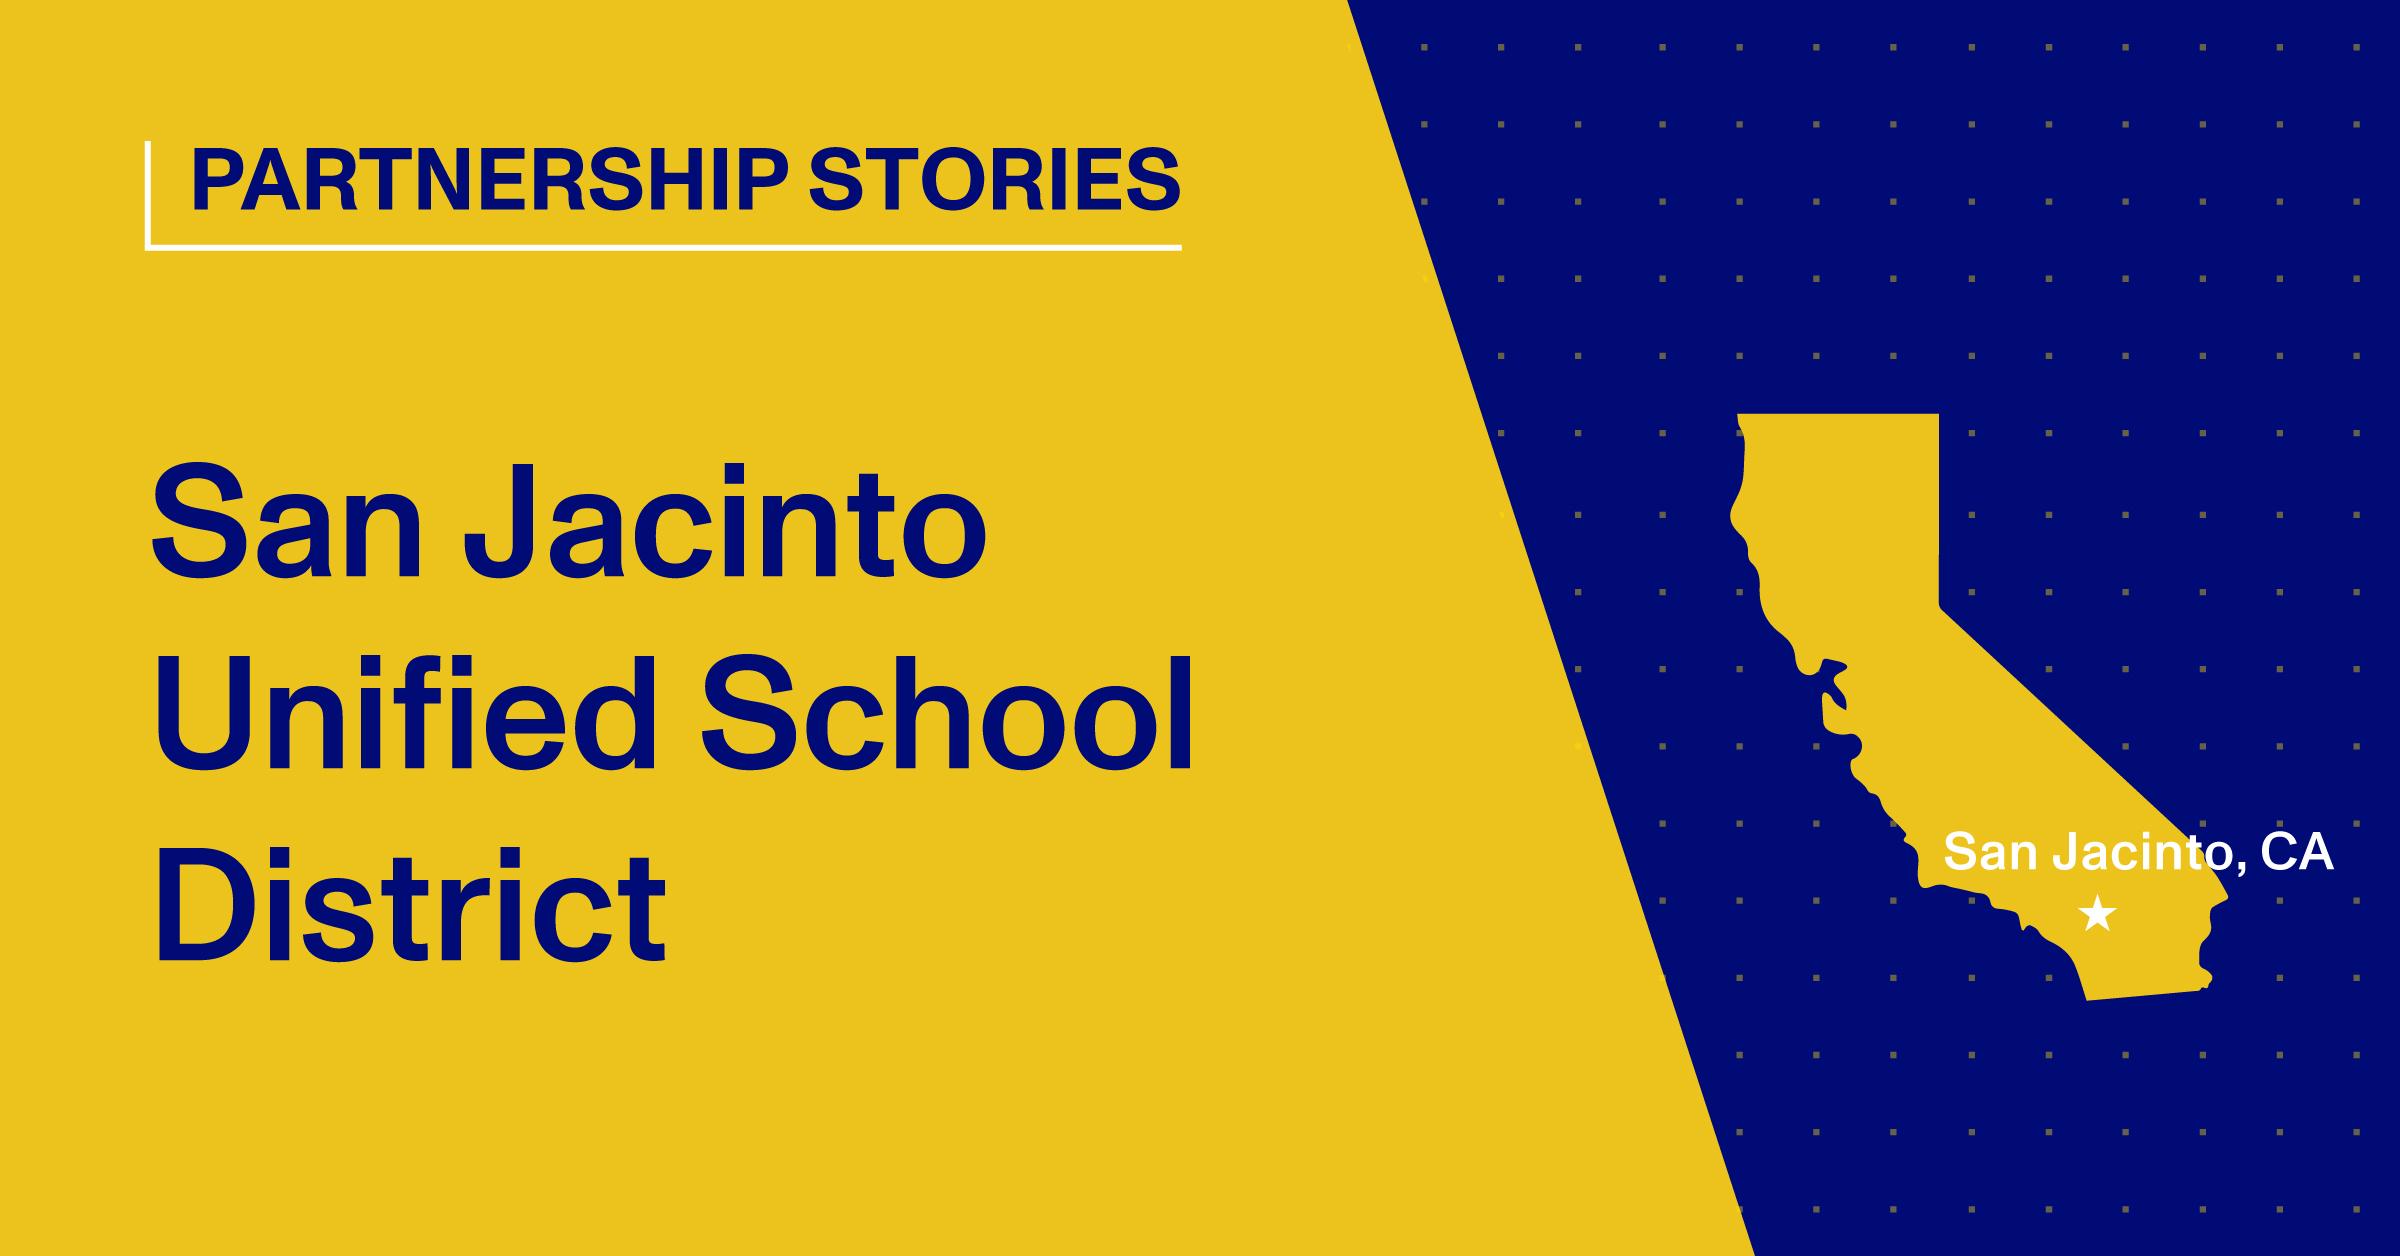 San Jacinto Unified School District